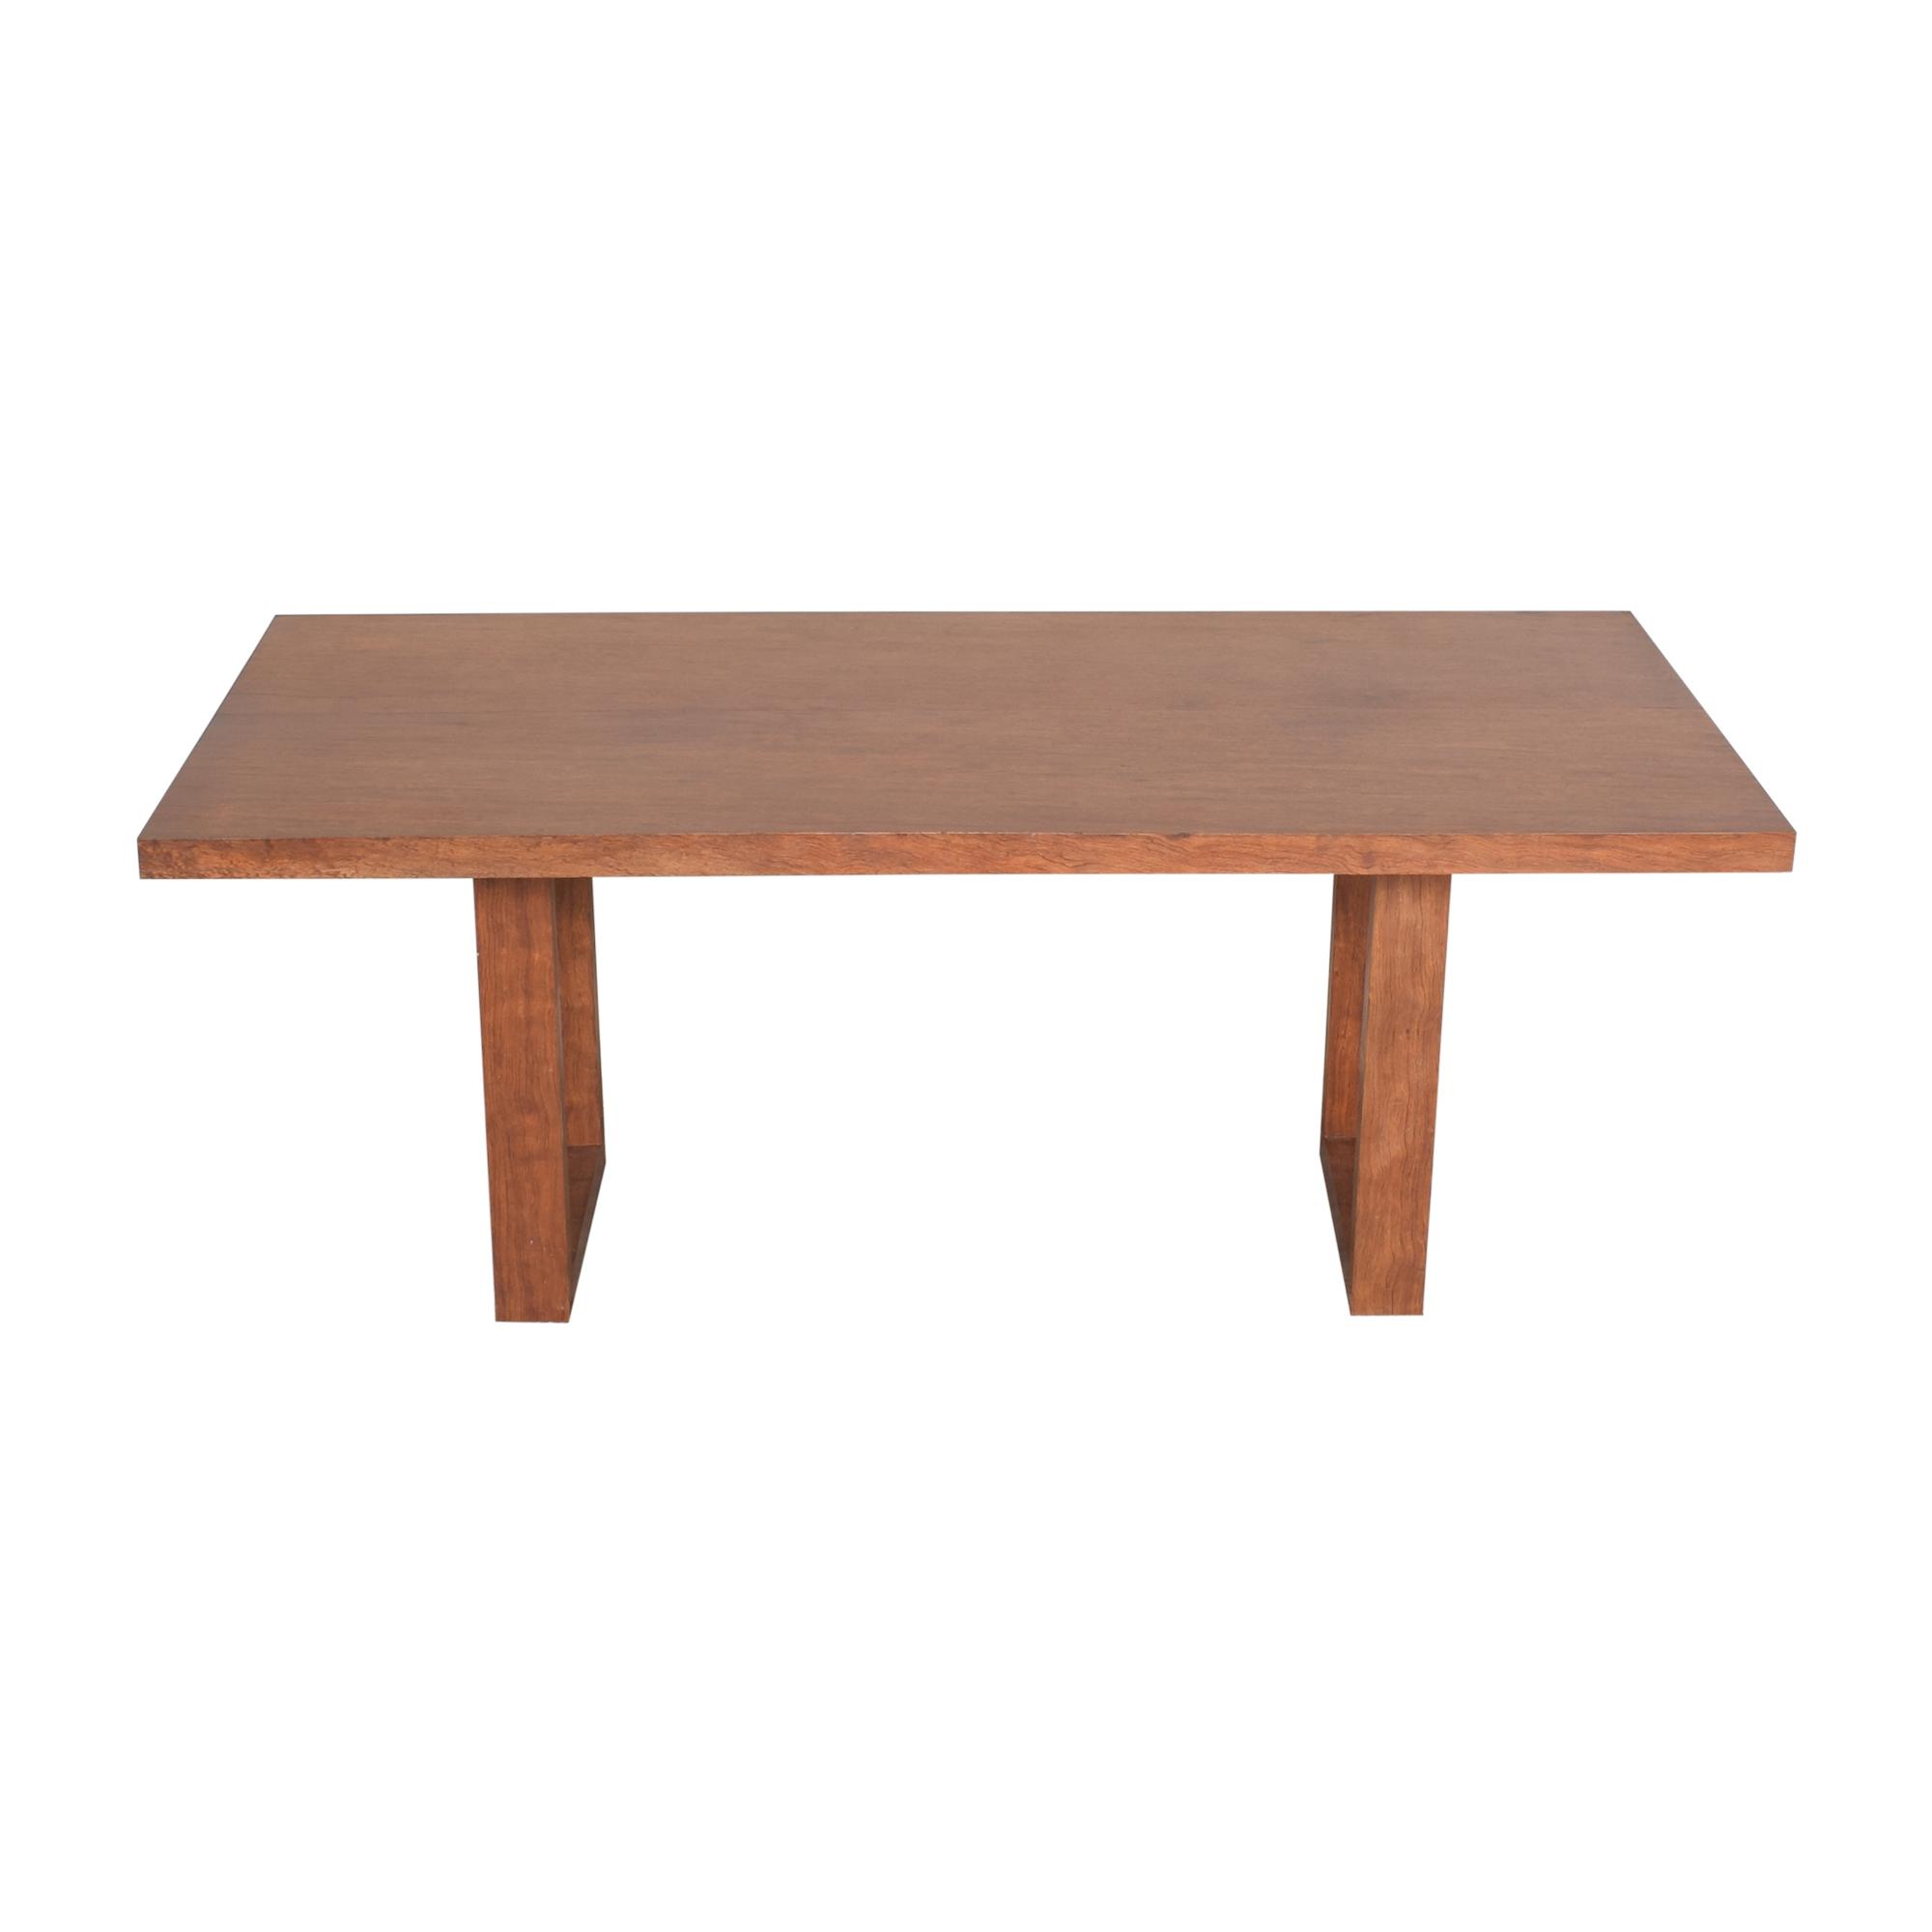 Custom Made Rectangular Dining Table for sale